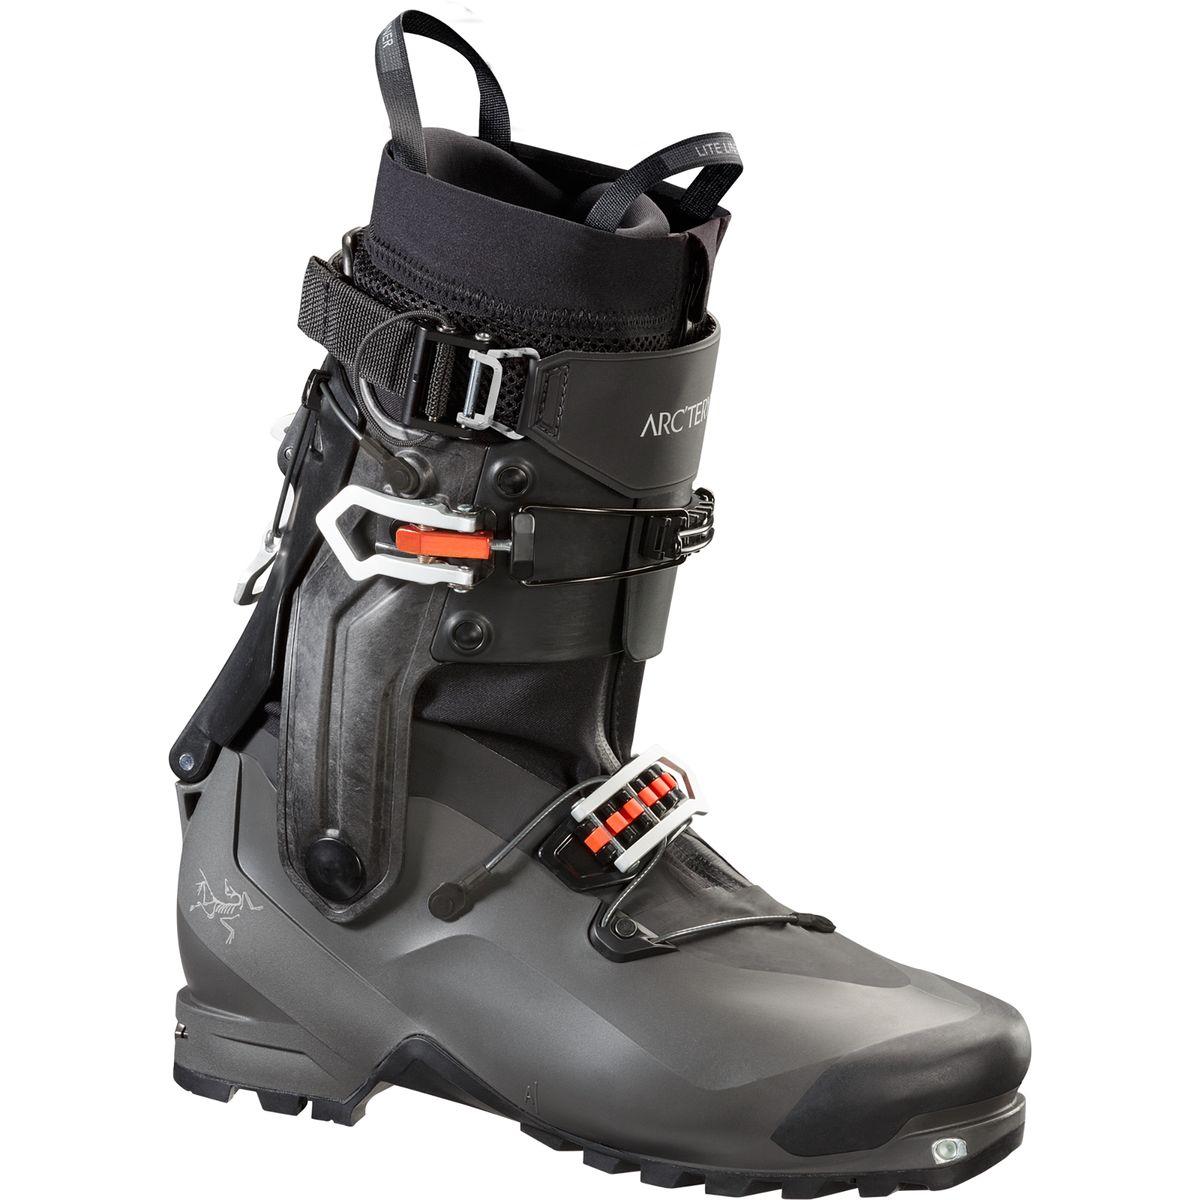 photo: Arc'teryx Women's Procline Lite alpine touring boot